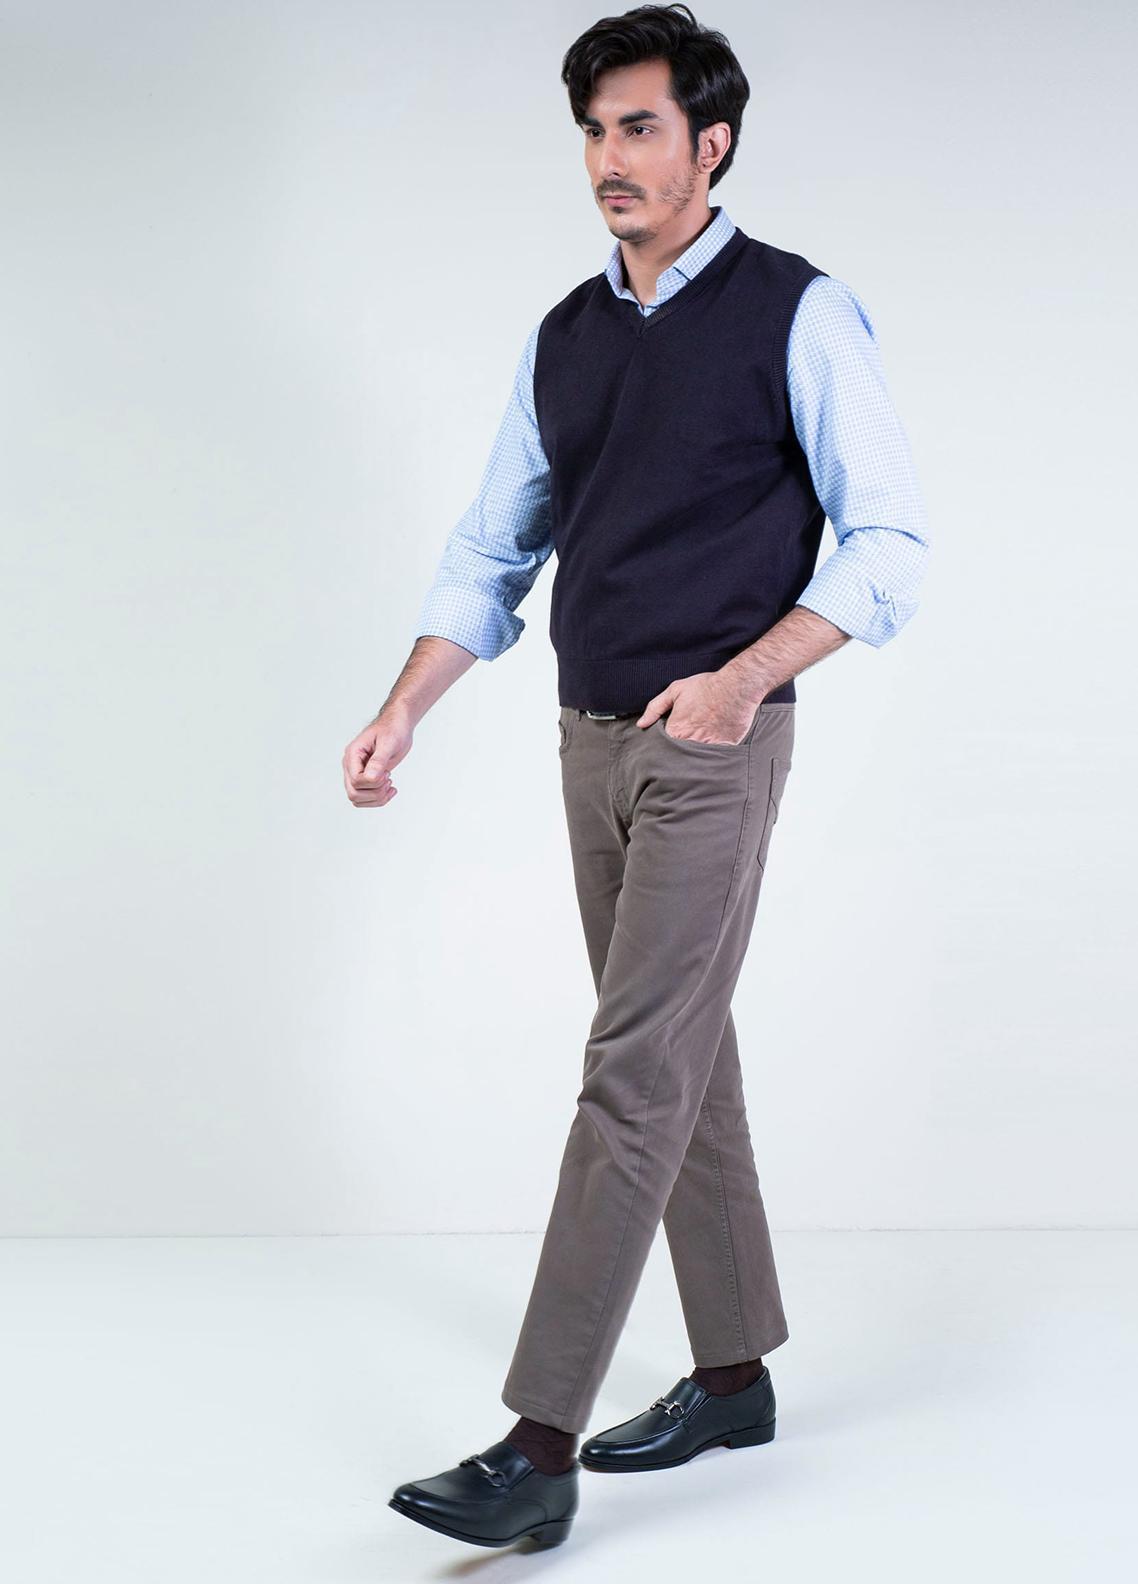 Brumano Cotton Sleeveless Men V-Neck Sweaters -  SL-013